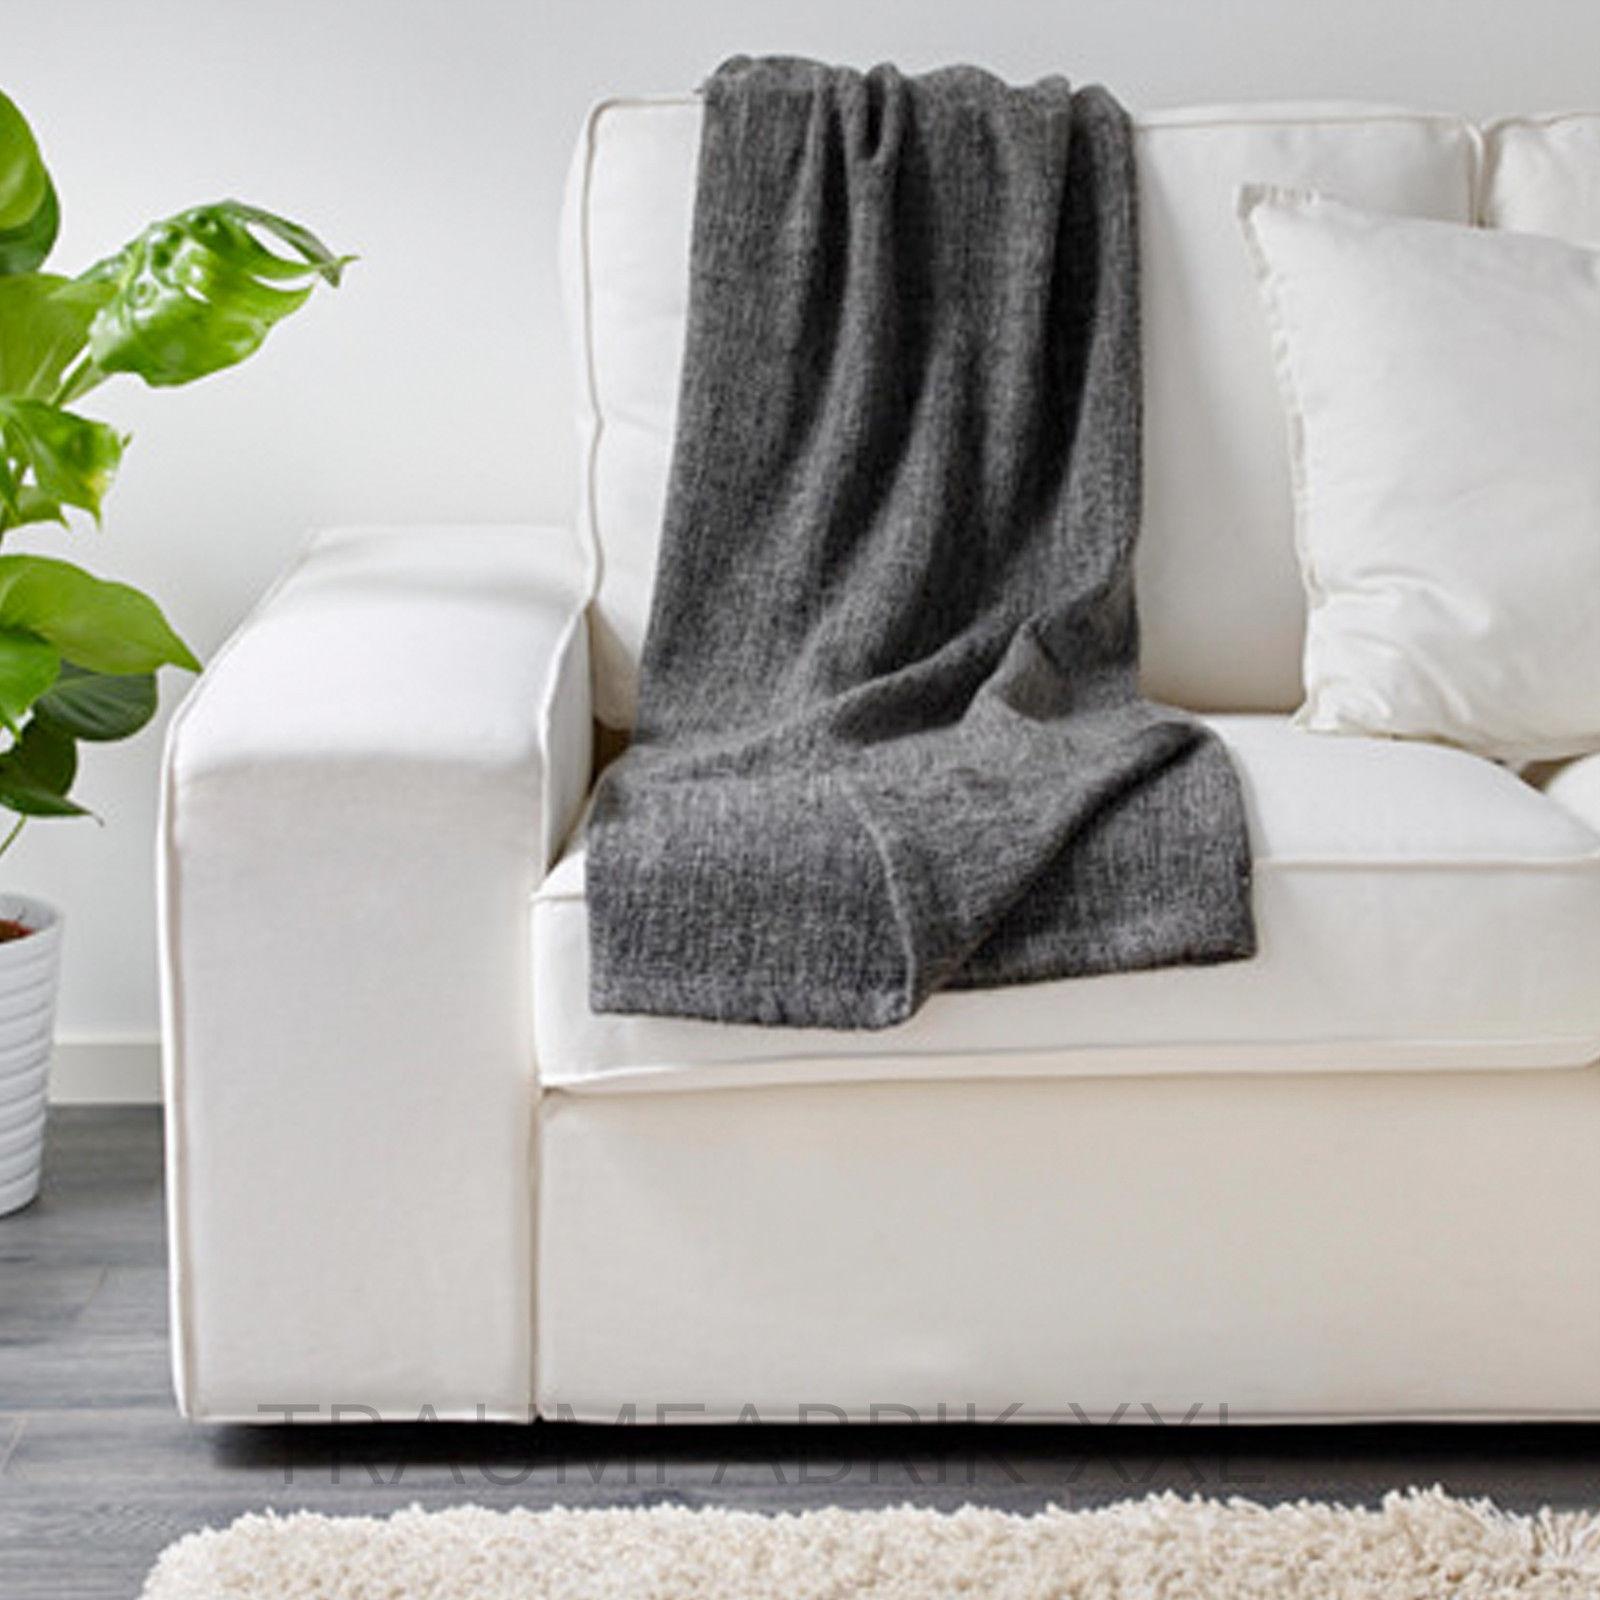 Ikea Gurli Grau Schwarz Tagesdecke 120x180cm Kuscheldecke Plaid Wolldecke Neu